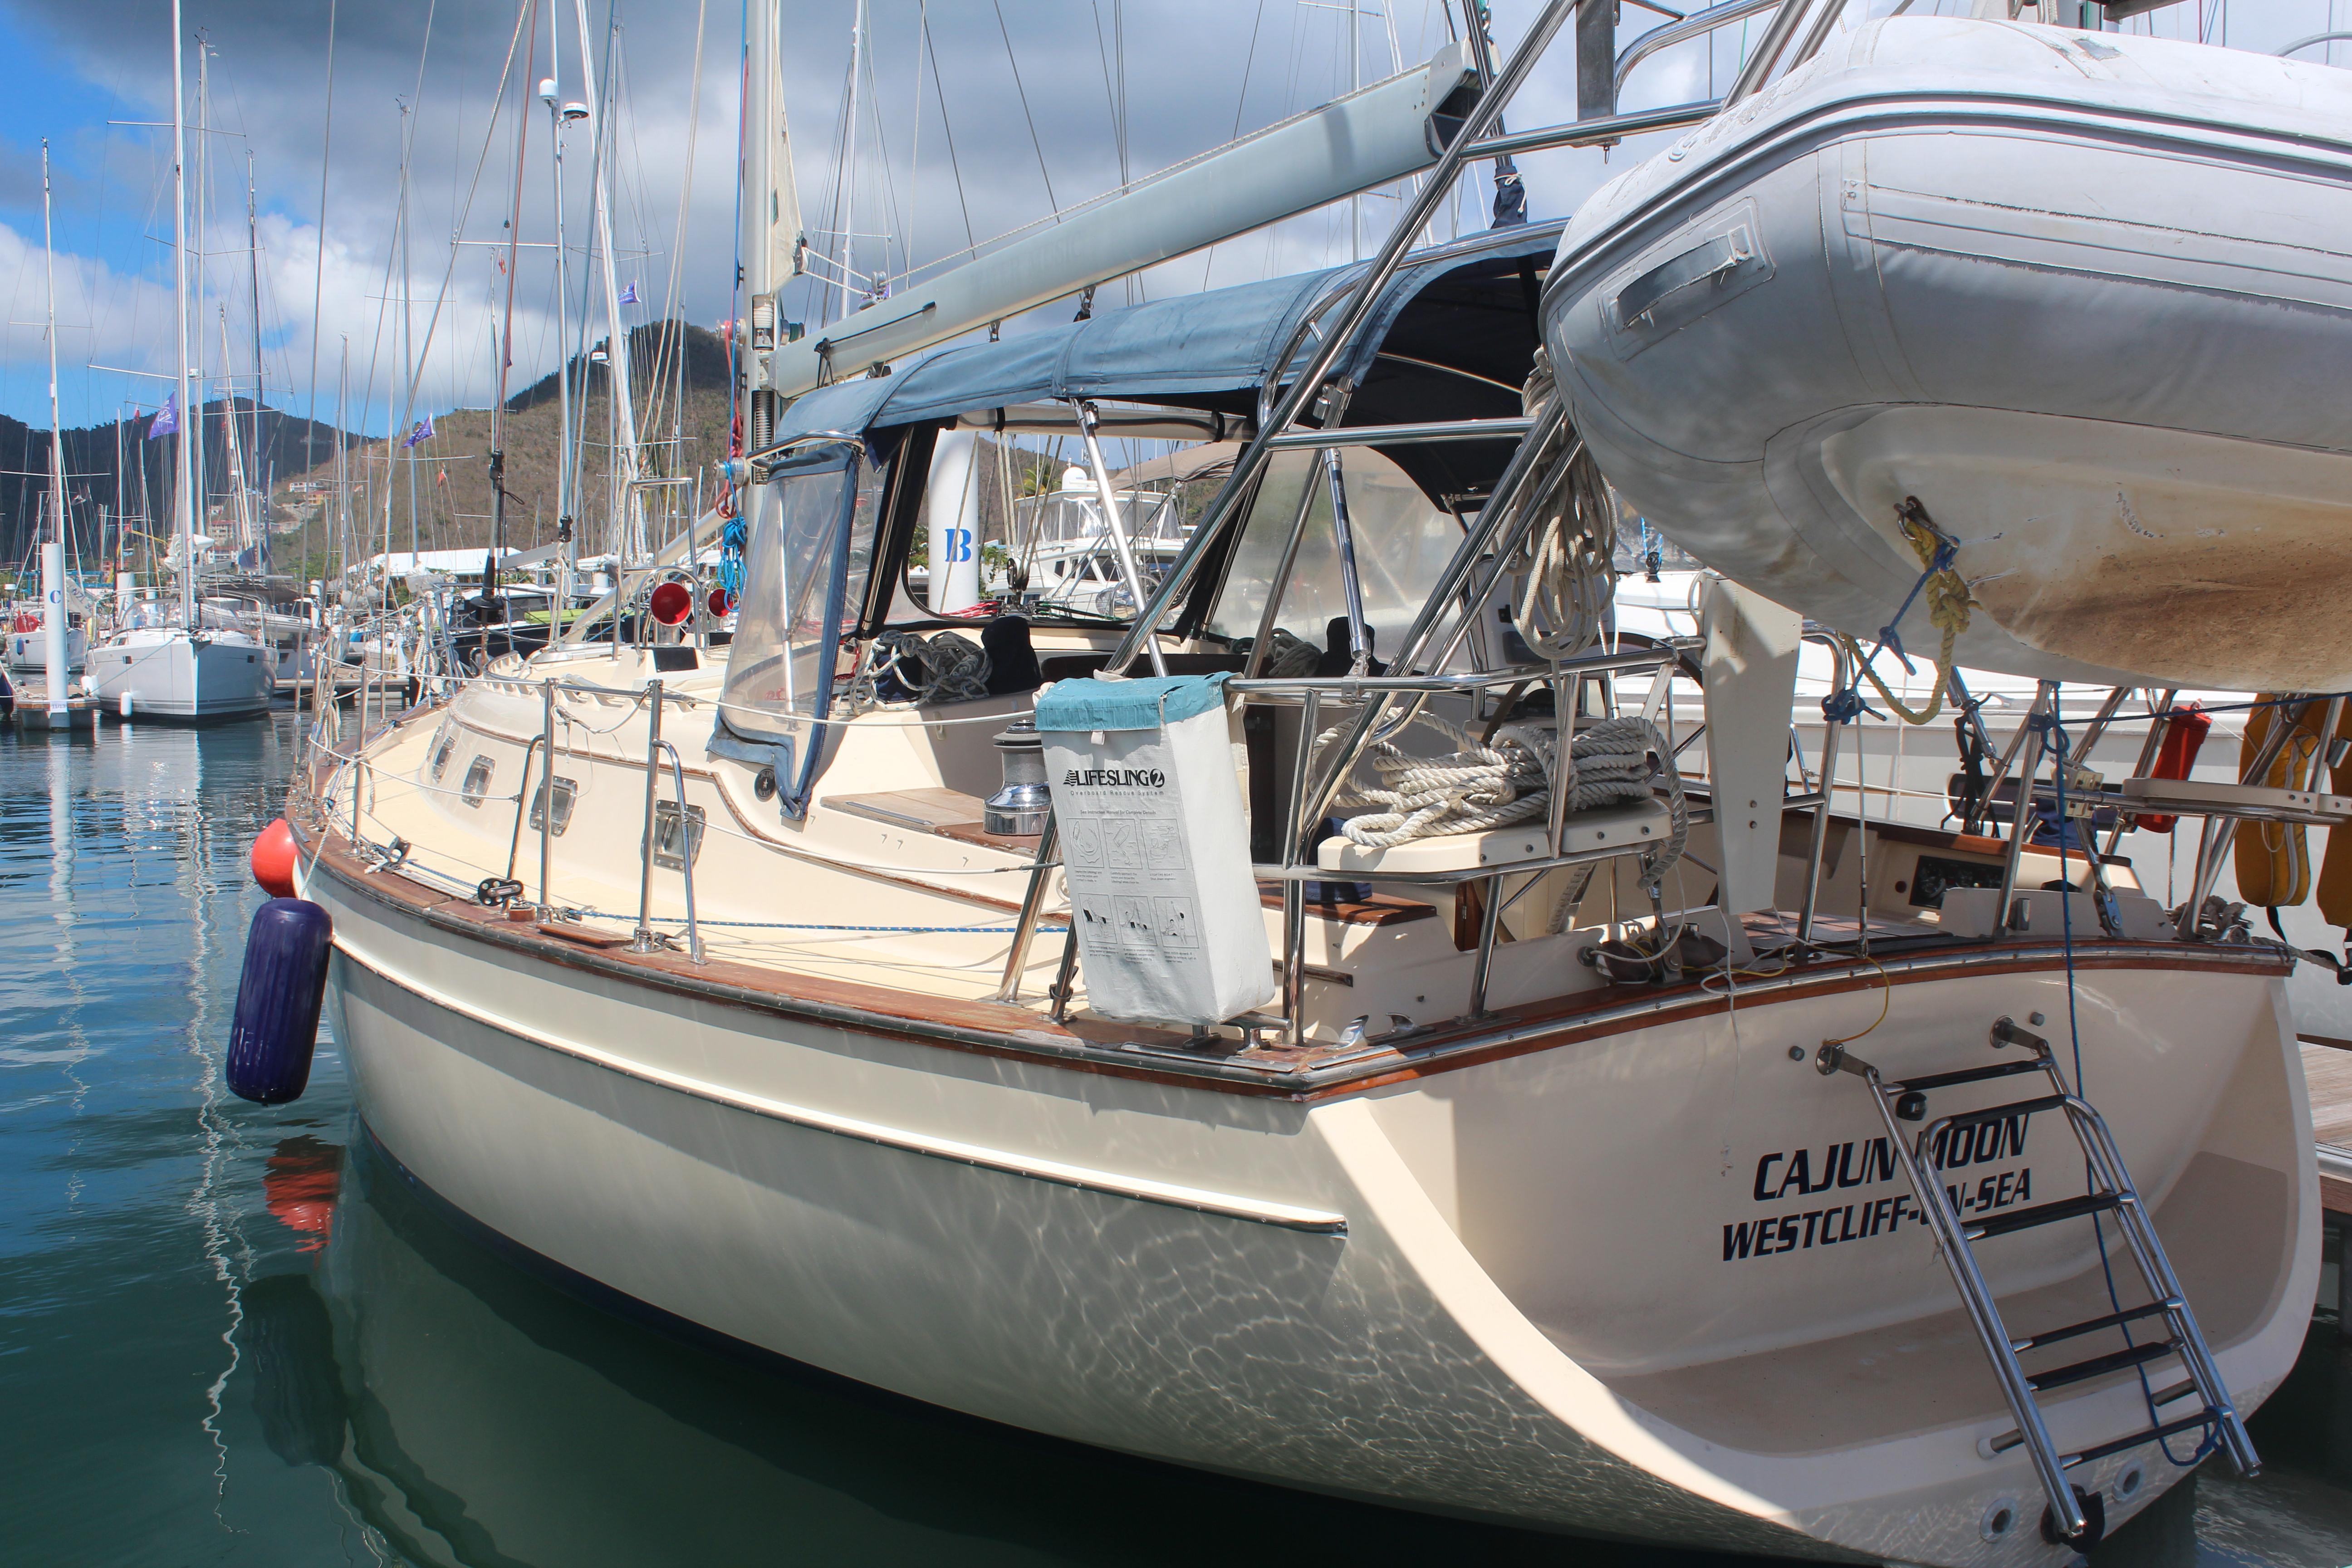 Island Packet 420 Dockside at Nanny Cay